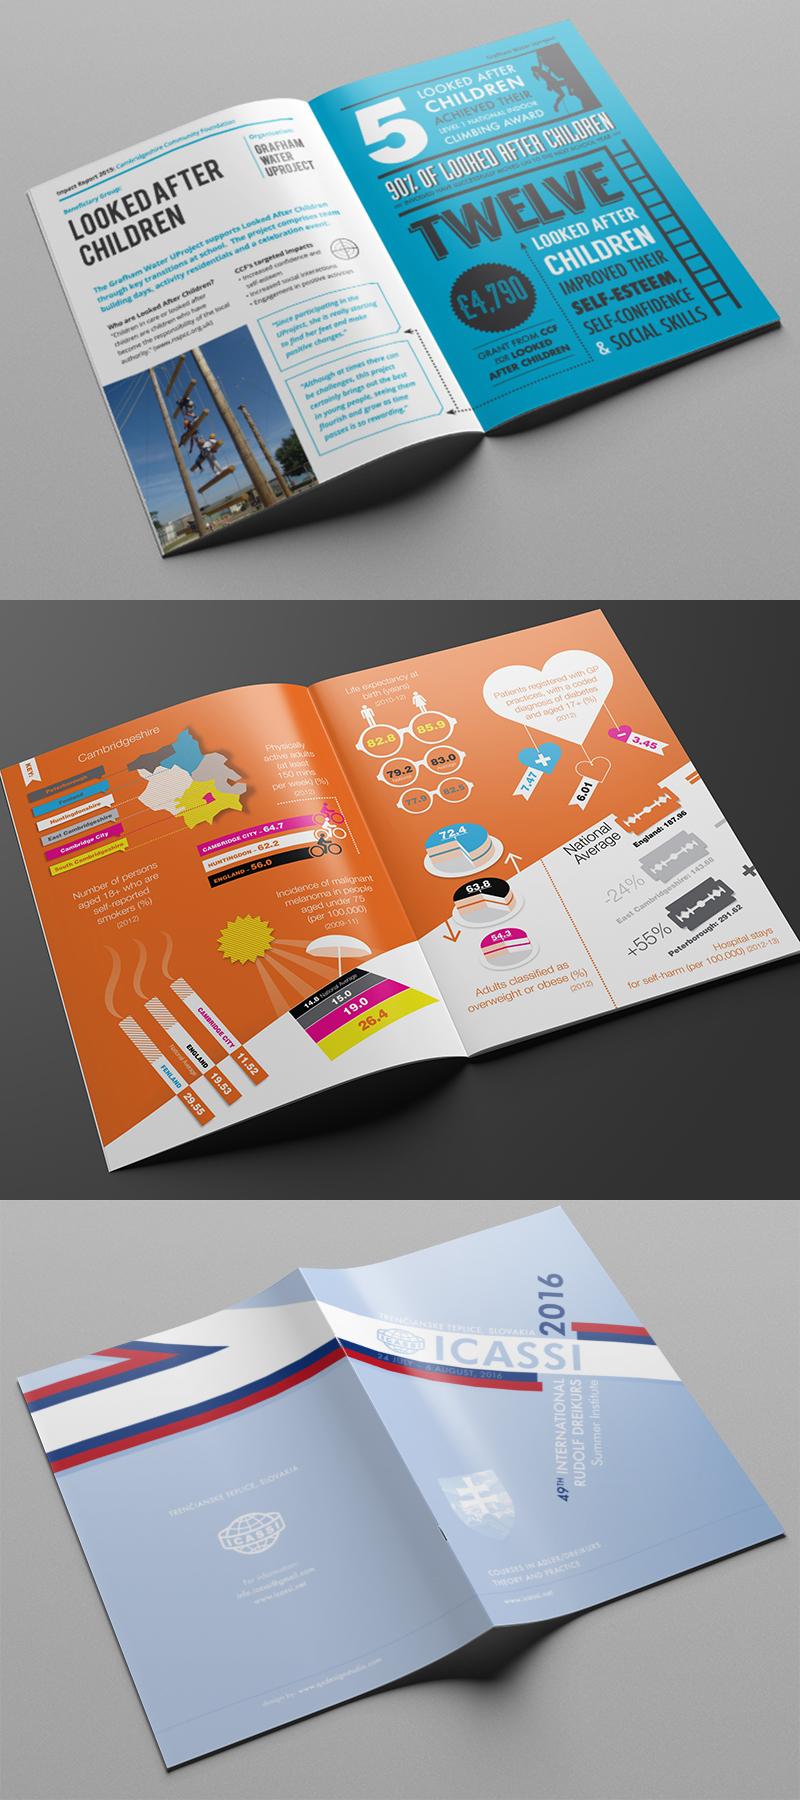 Cambridge graphic design services